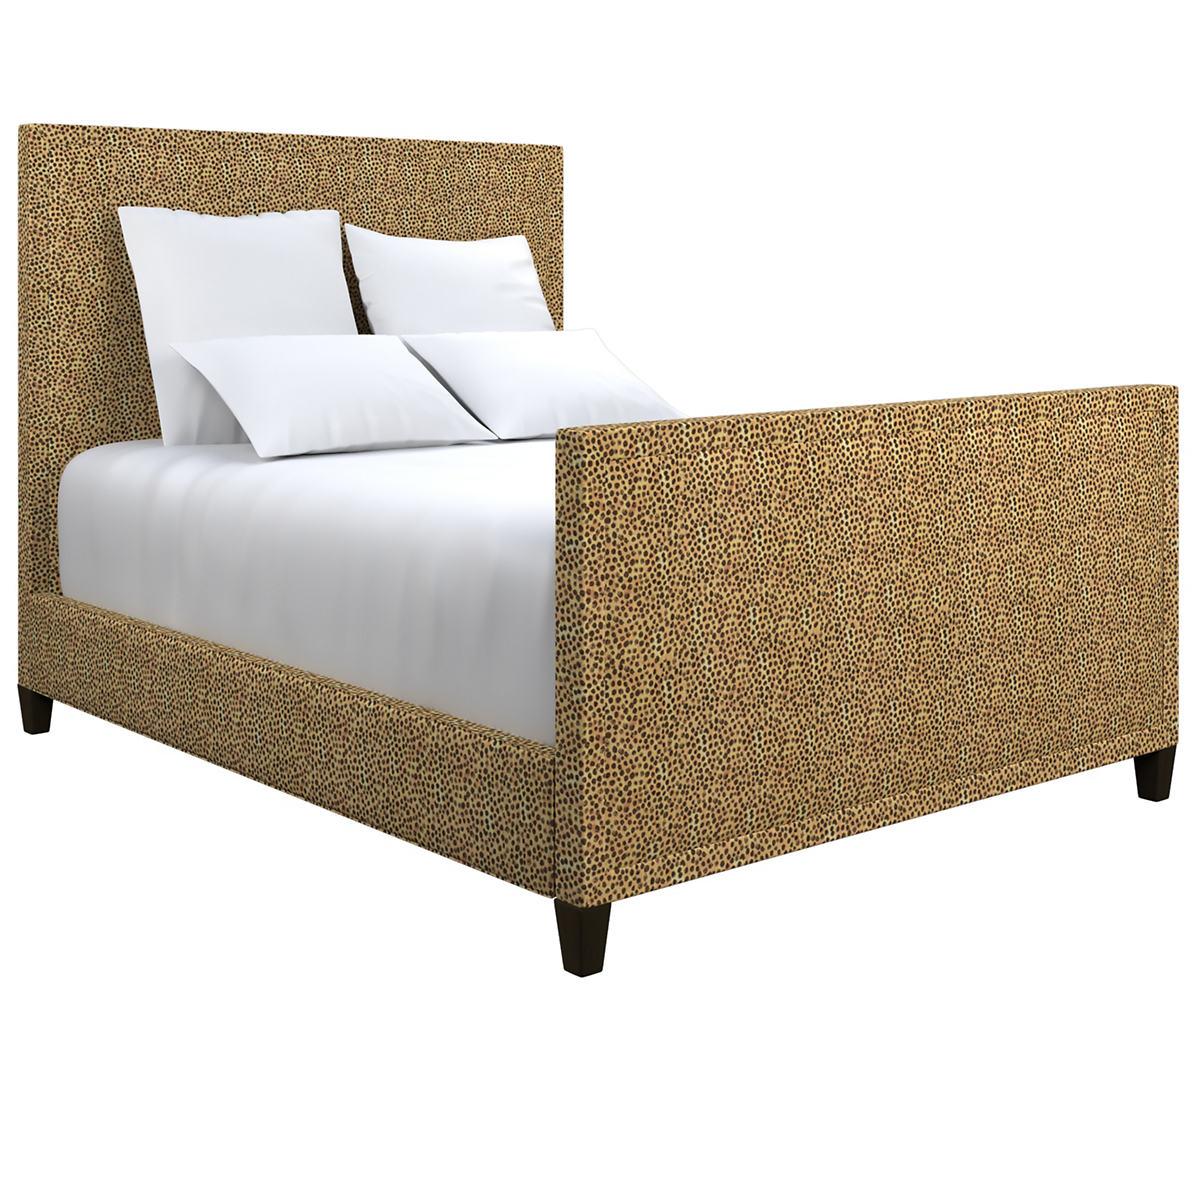 Cheetah Linen Colebrook Smoke Bed